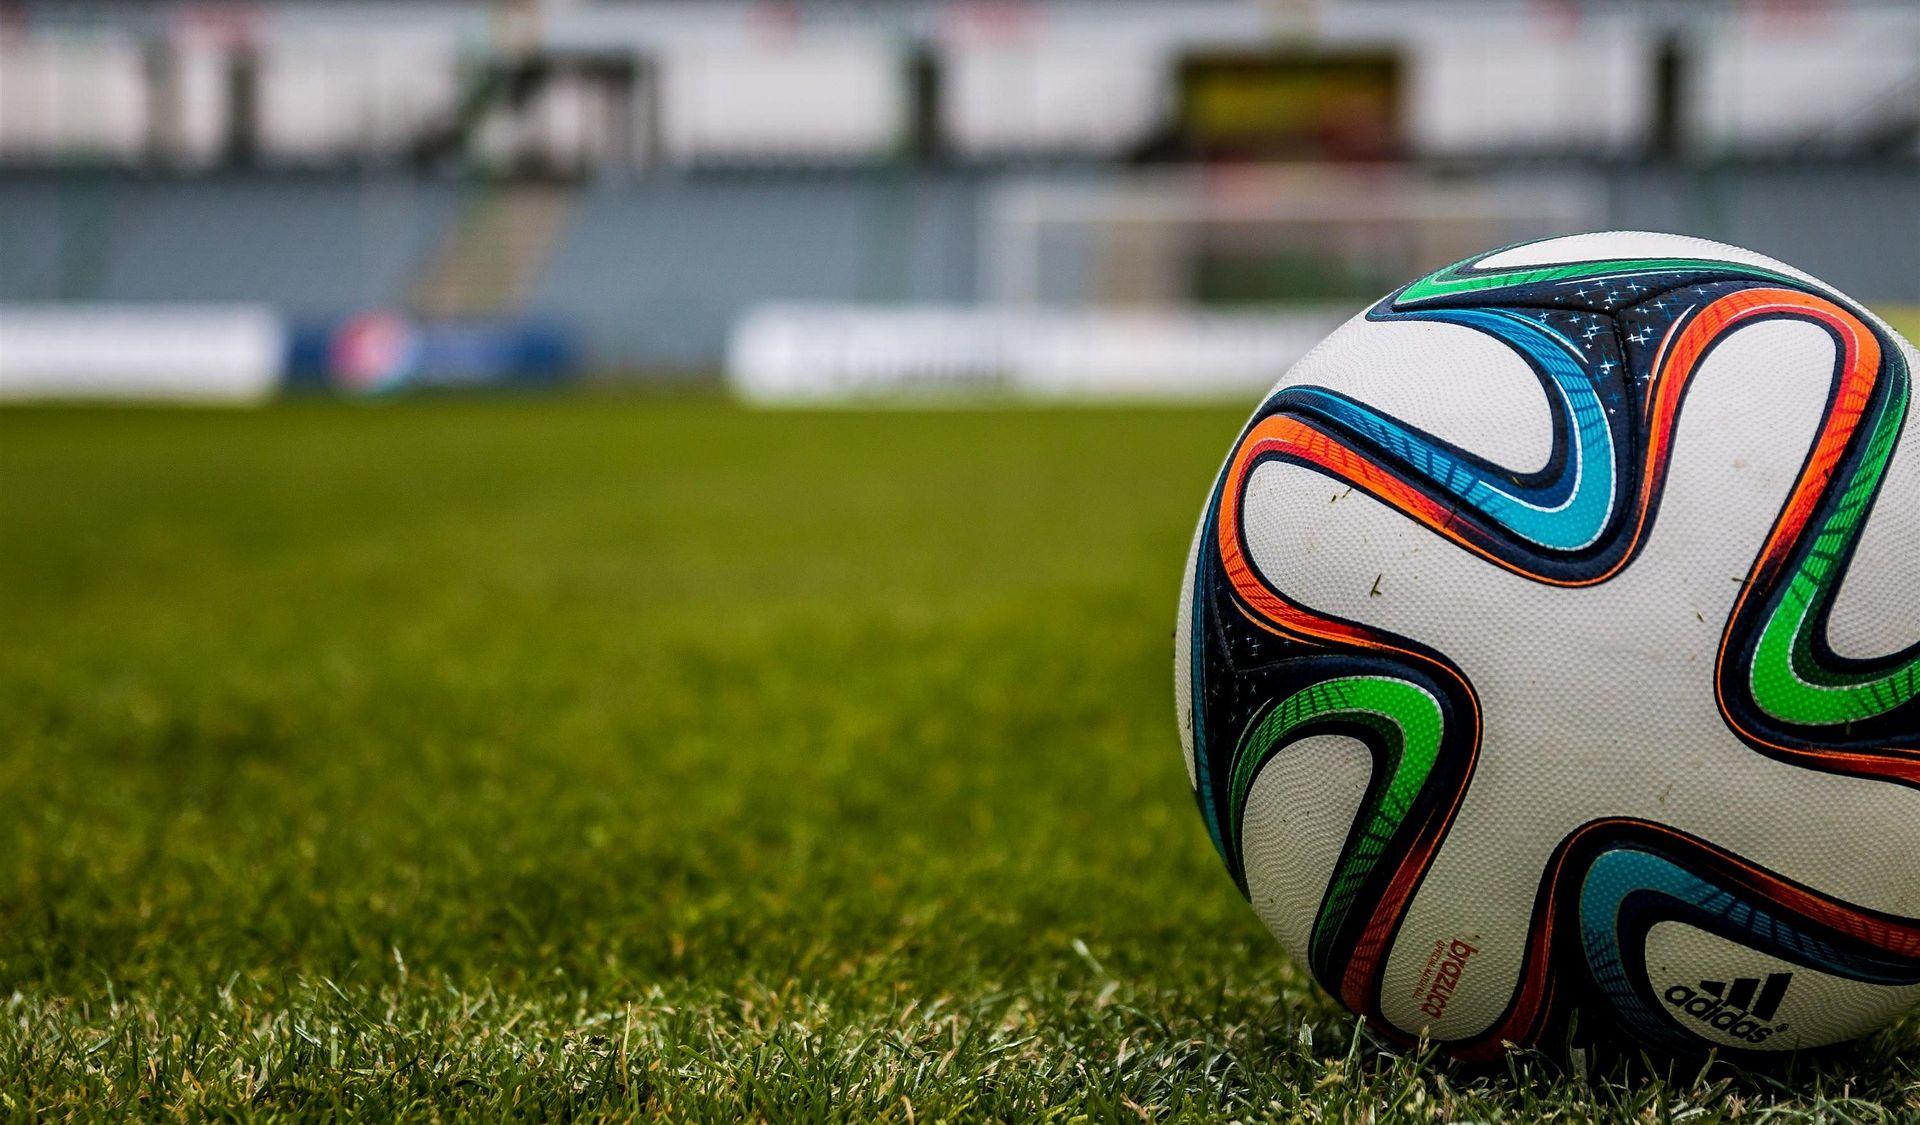 Morata čeka dogovor Reala i Manchester Uniteda, na Old Trafford dolazi švedski stoper Lindelof